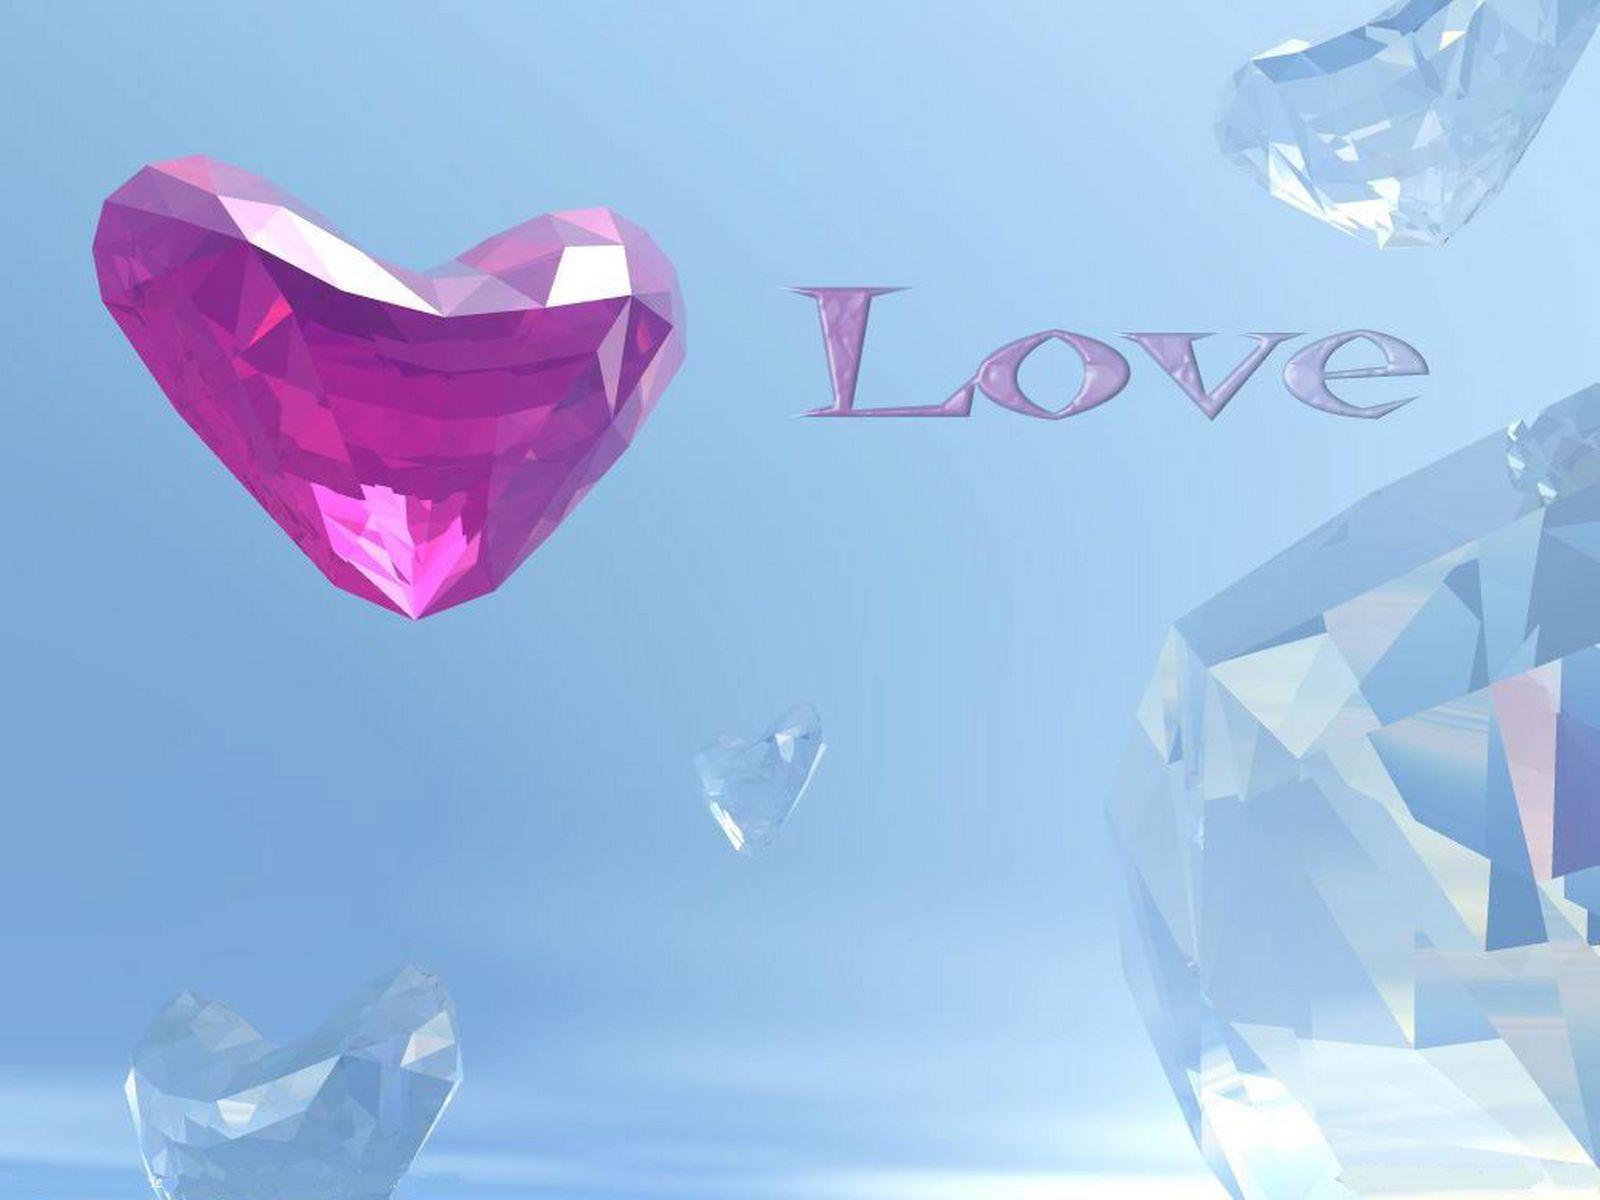 http://2.bp.blogspot.com/-J4b6p4CEobQ/TviLYnhVQbI/AAAAAAAABu0/8I7K424X7hM/s1600/Love-Mobile+Wallpapers+%252810%2529.jpg